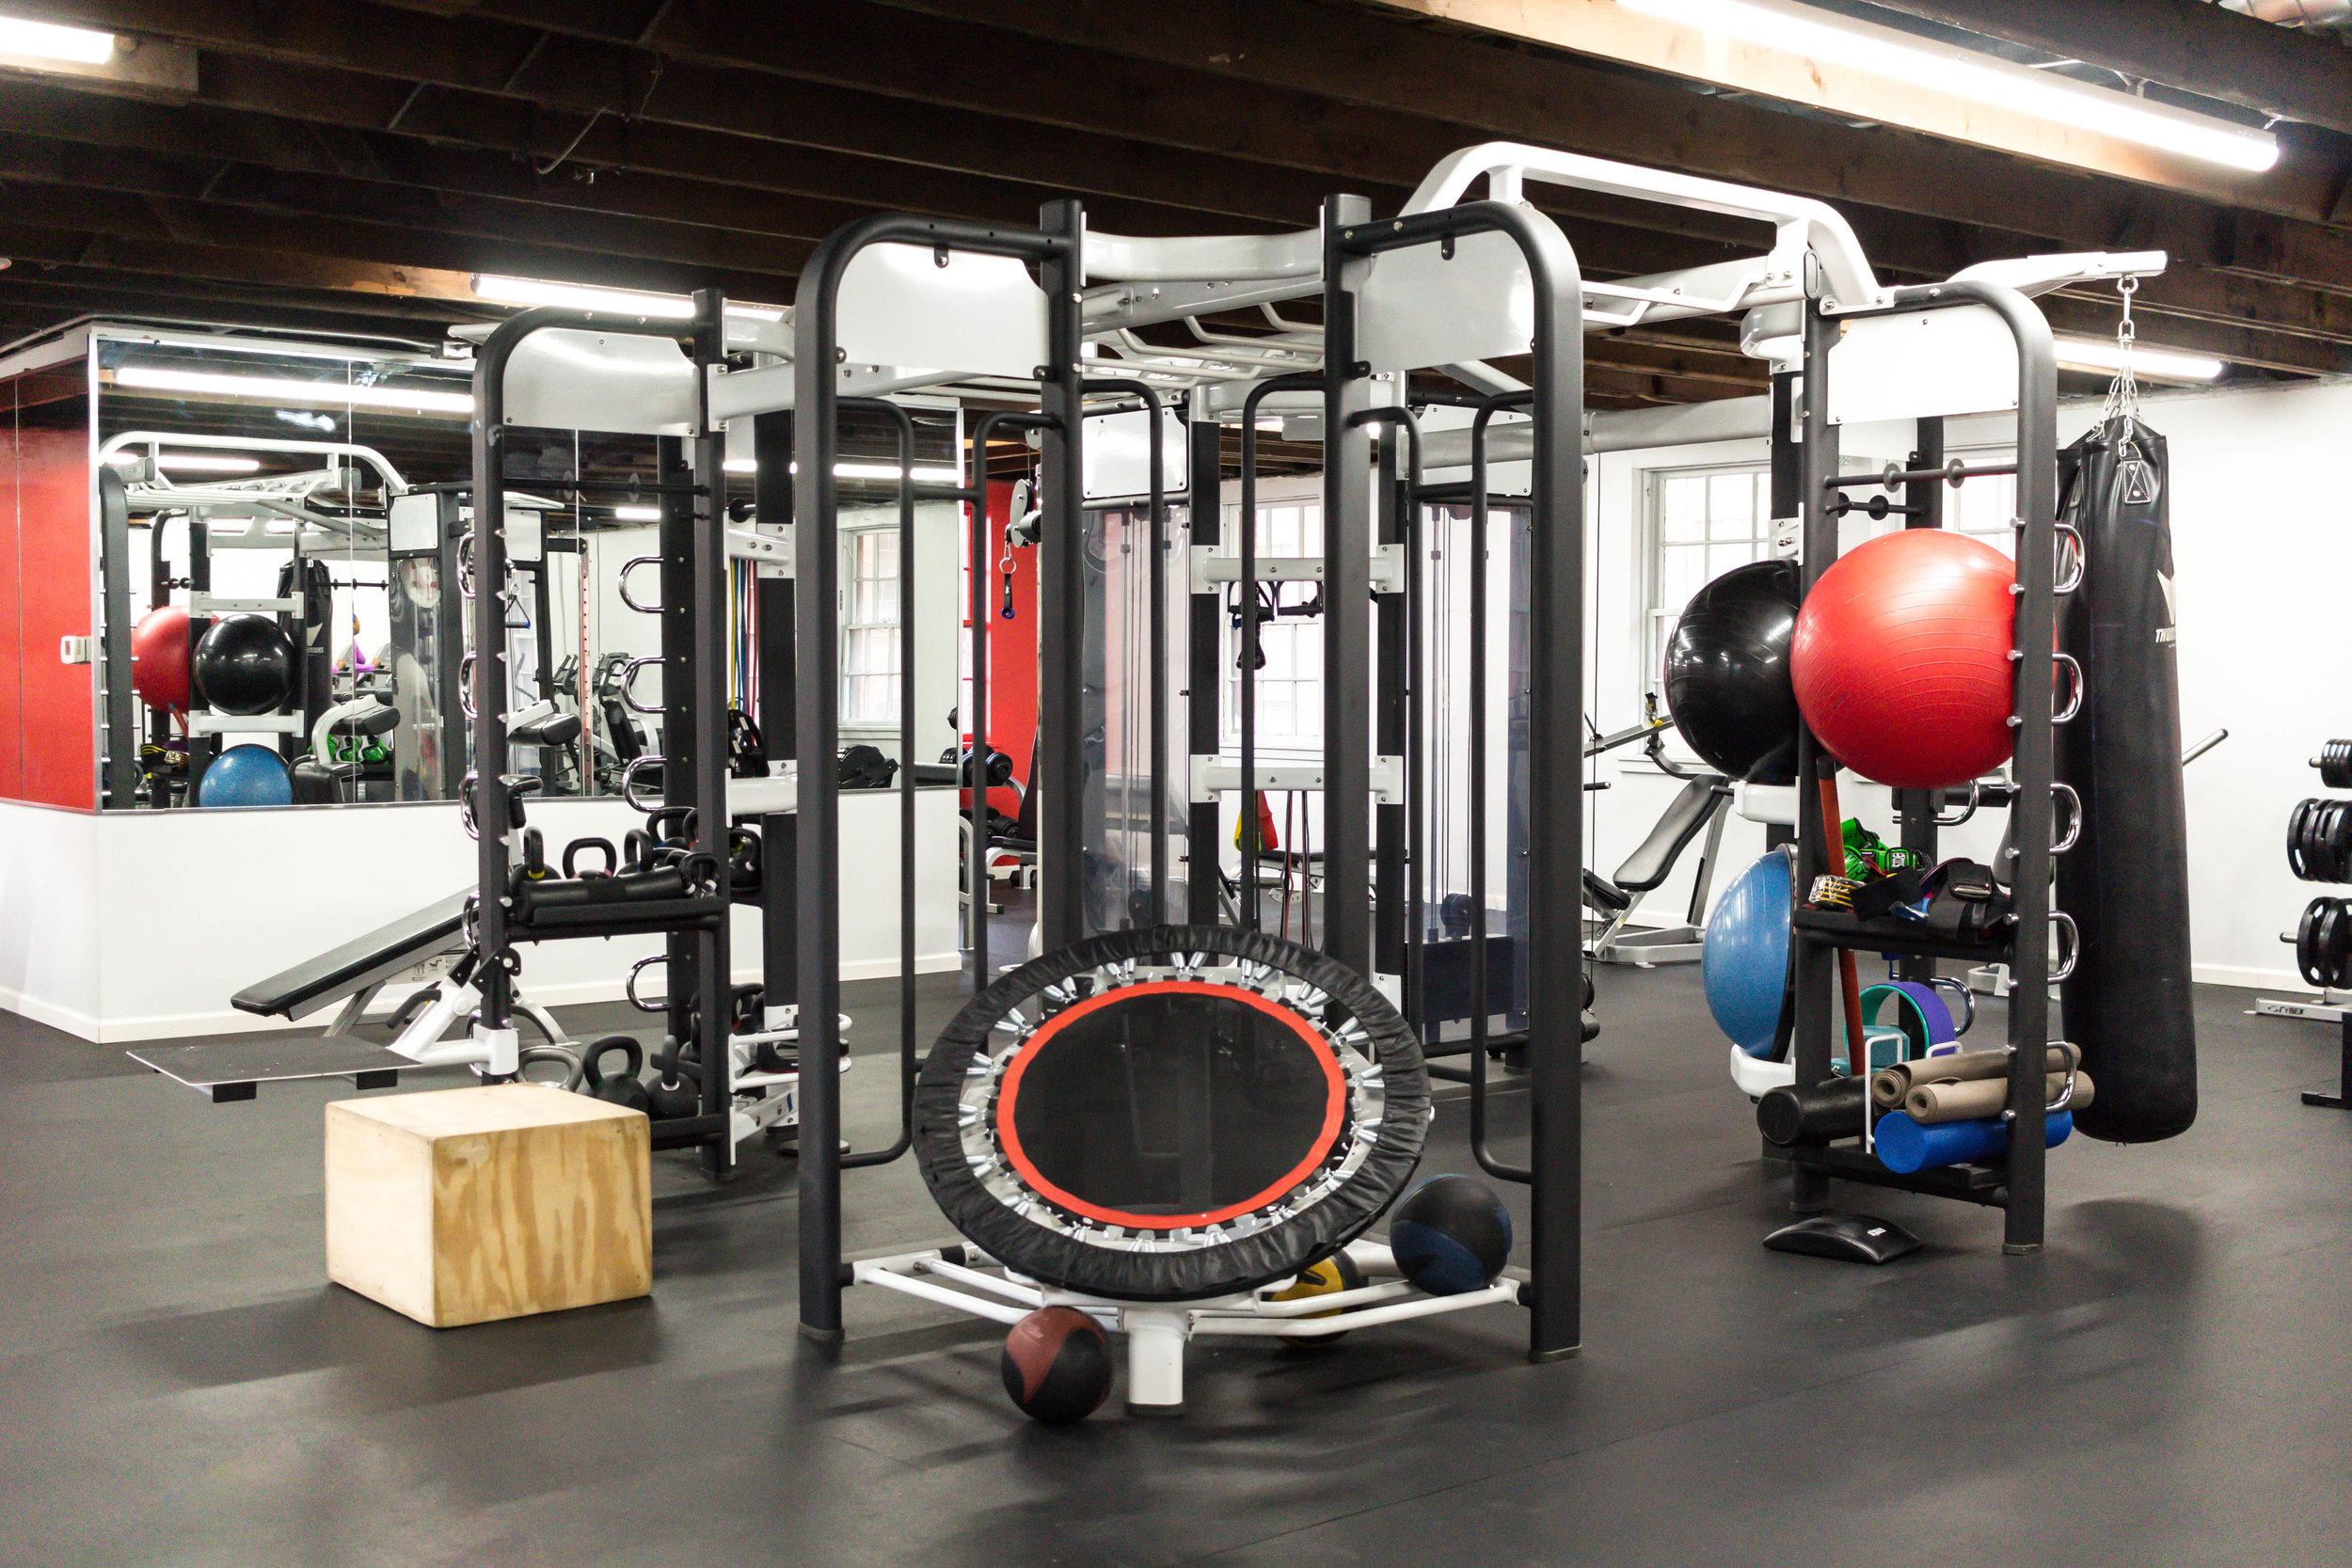 jungle gym-1.jpg